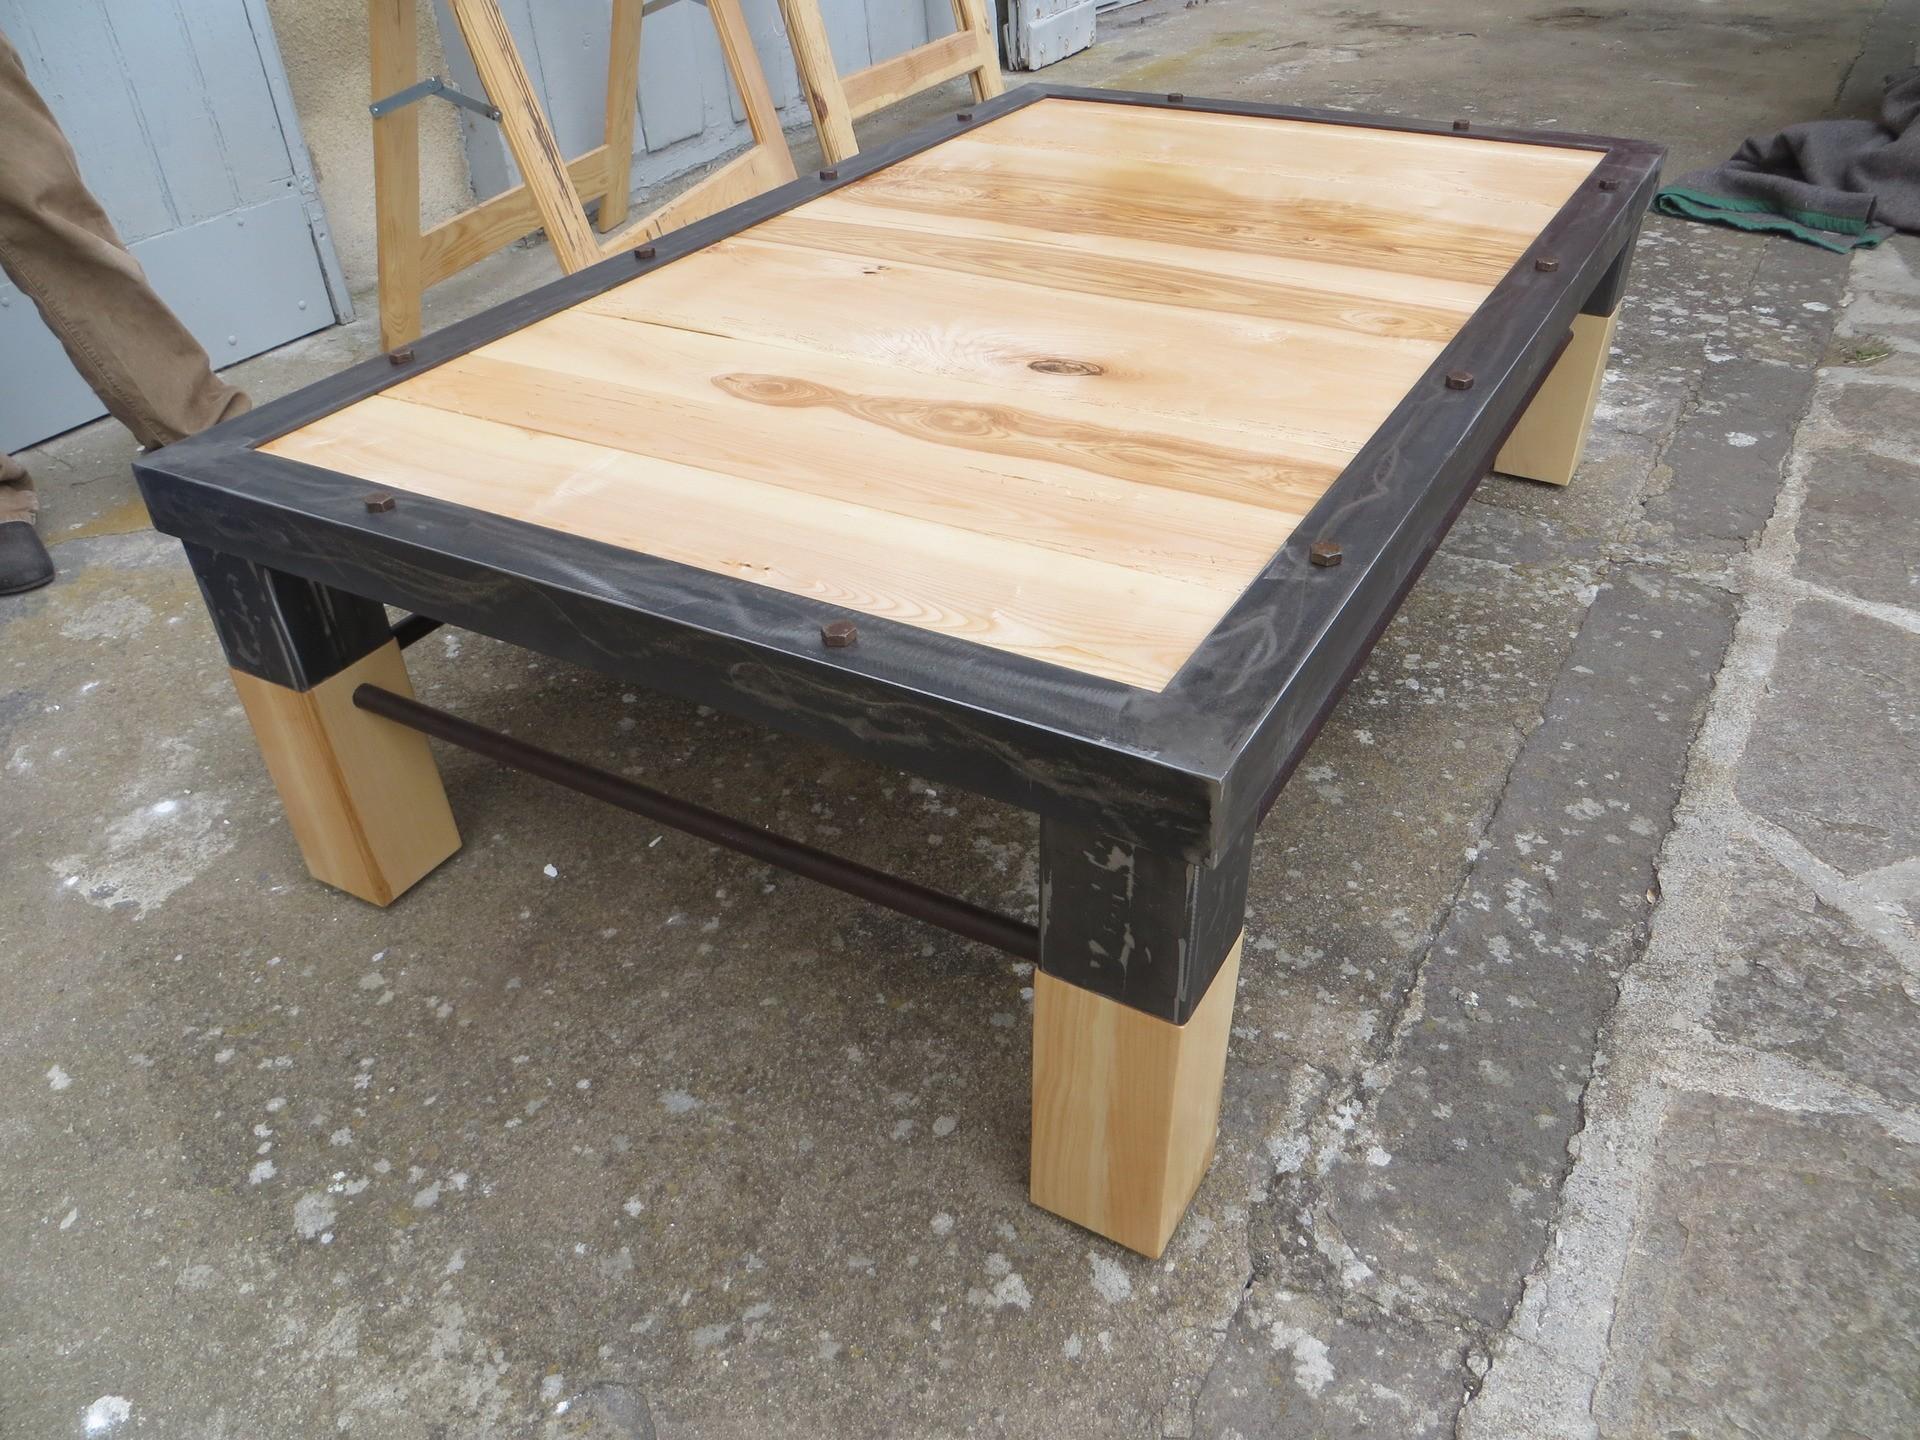 Idee table basse industrielle